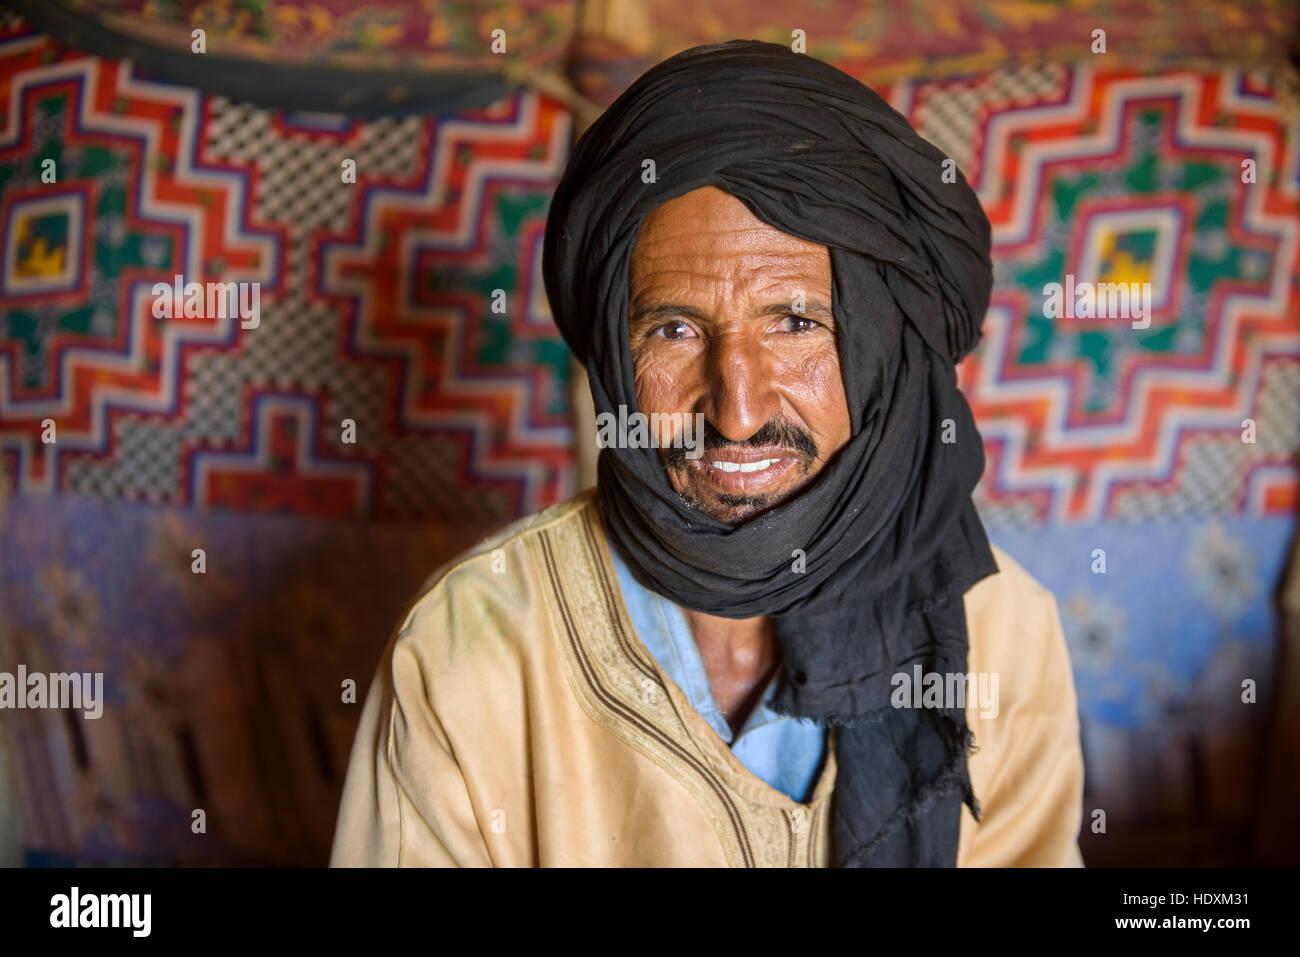 People of the Sahara, Mauritania - Stock Image